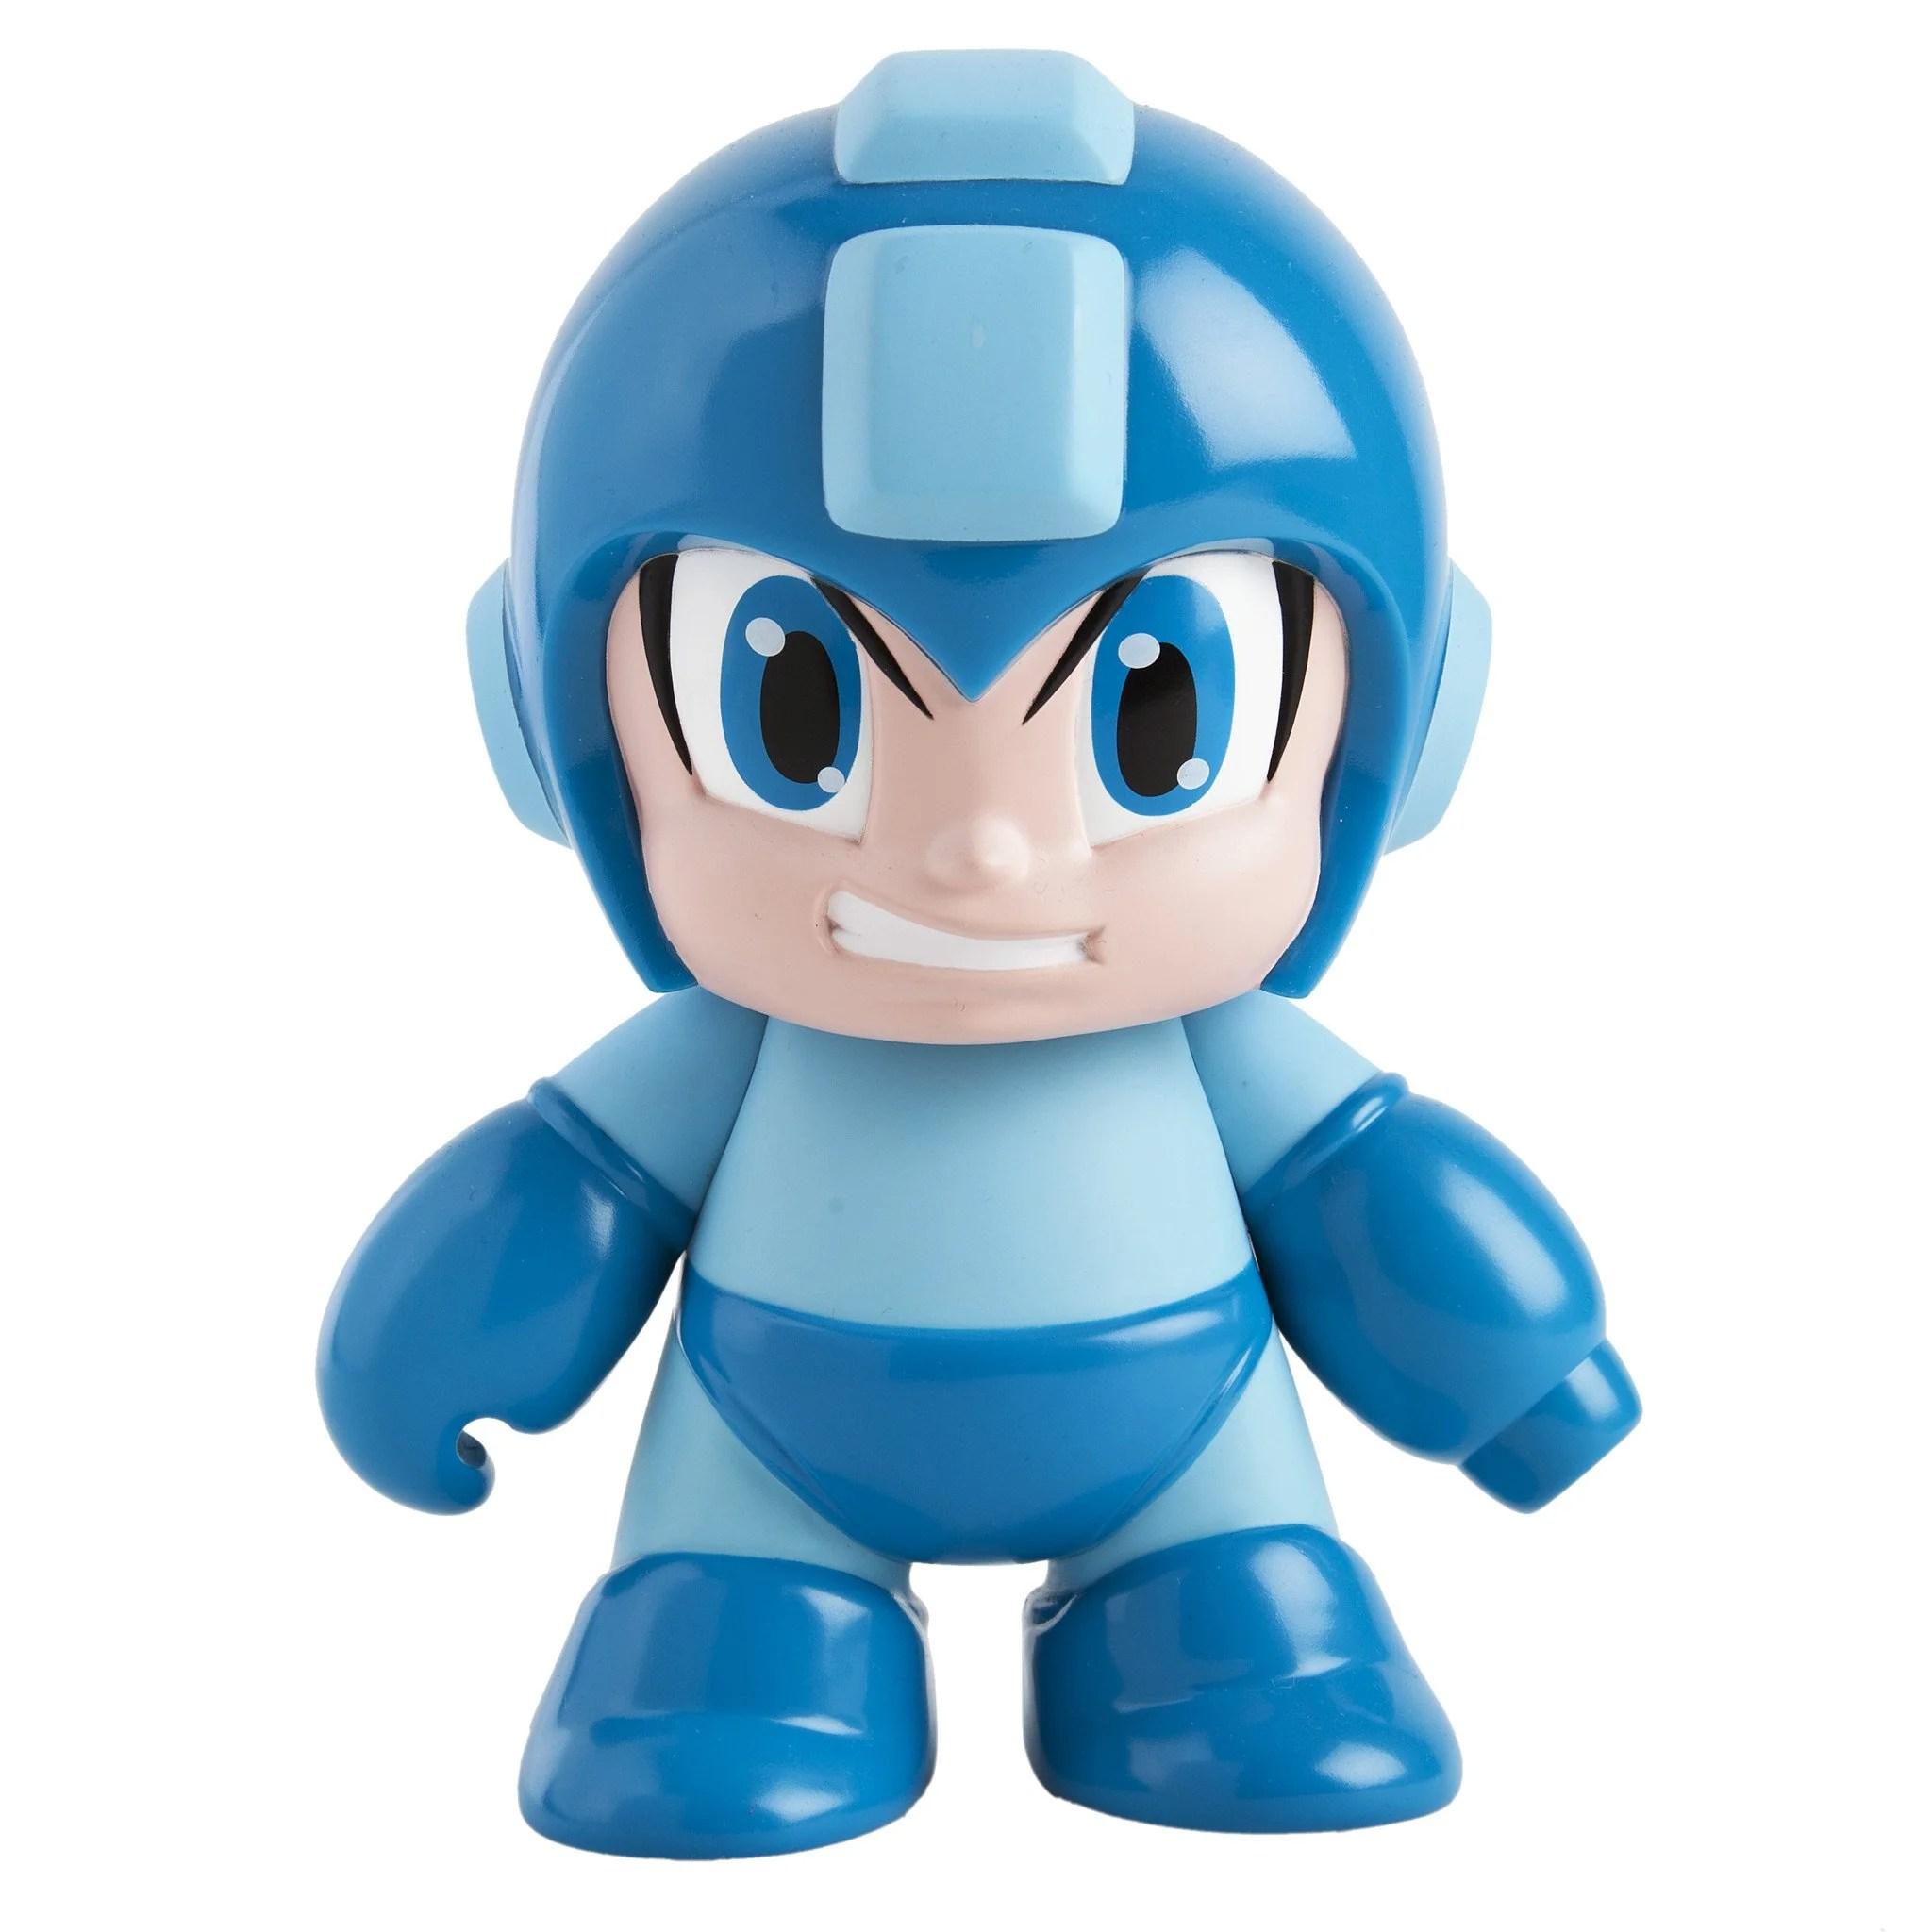 Mega Man 7 Medium Figure Kidrobot